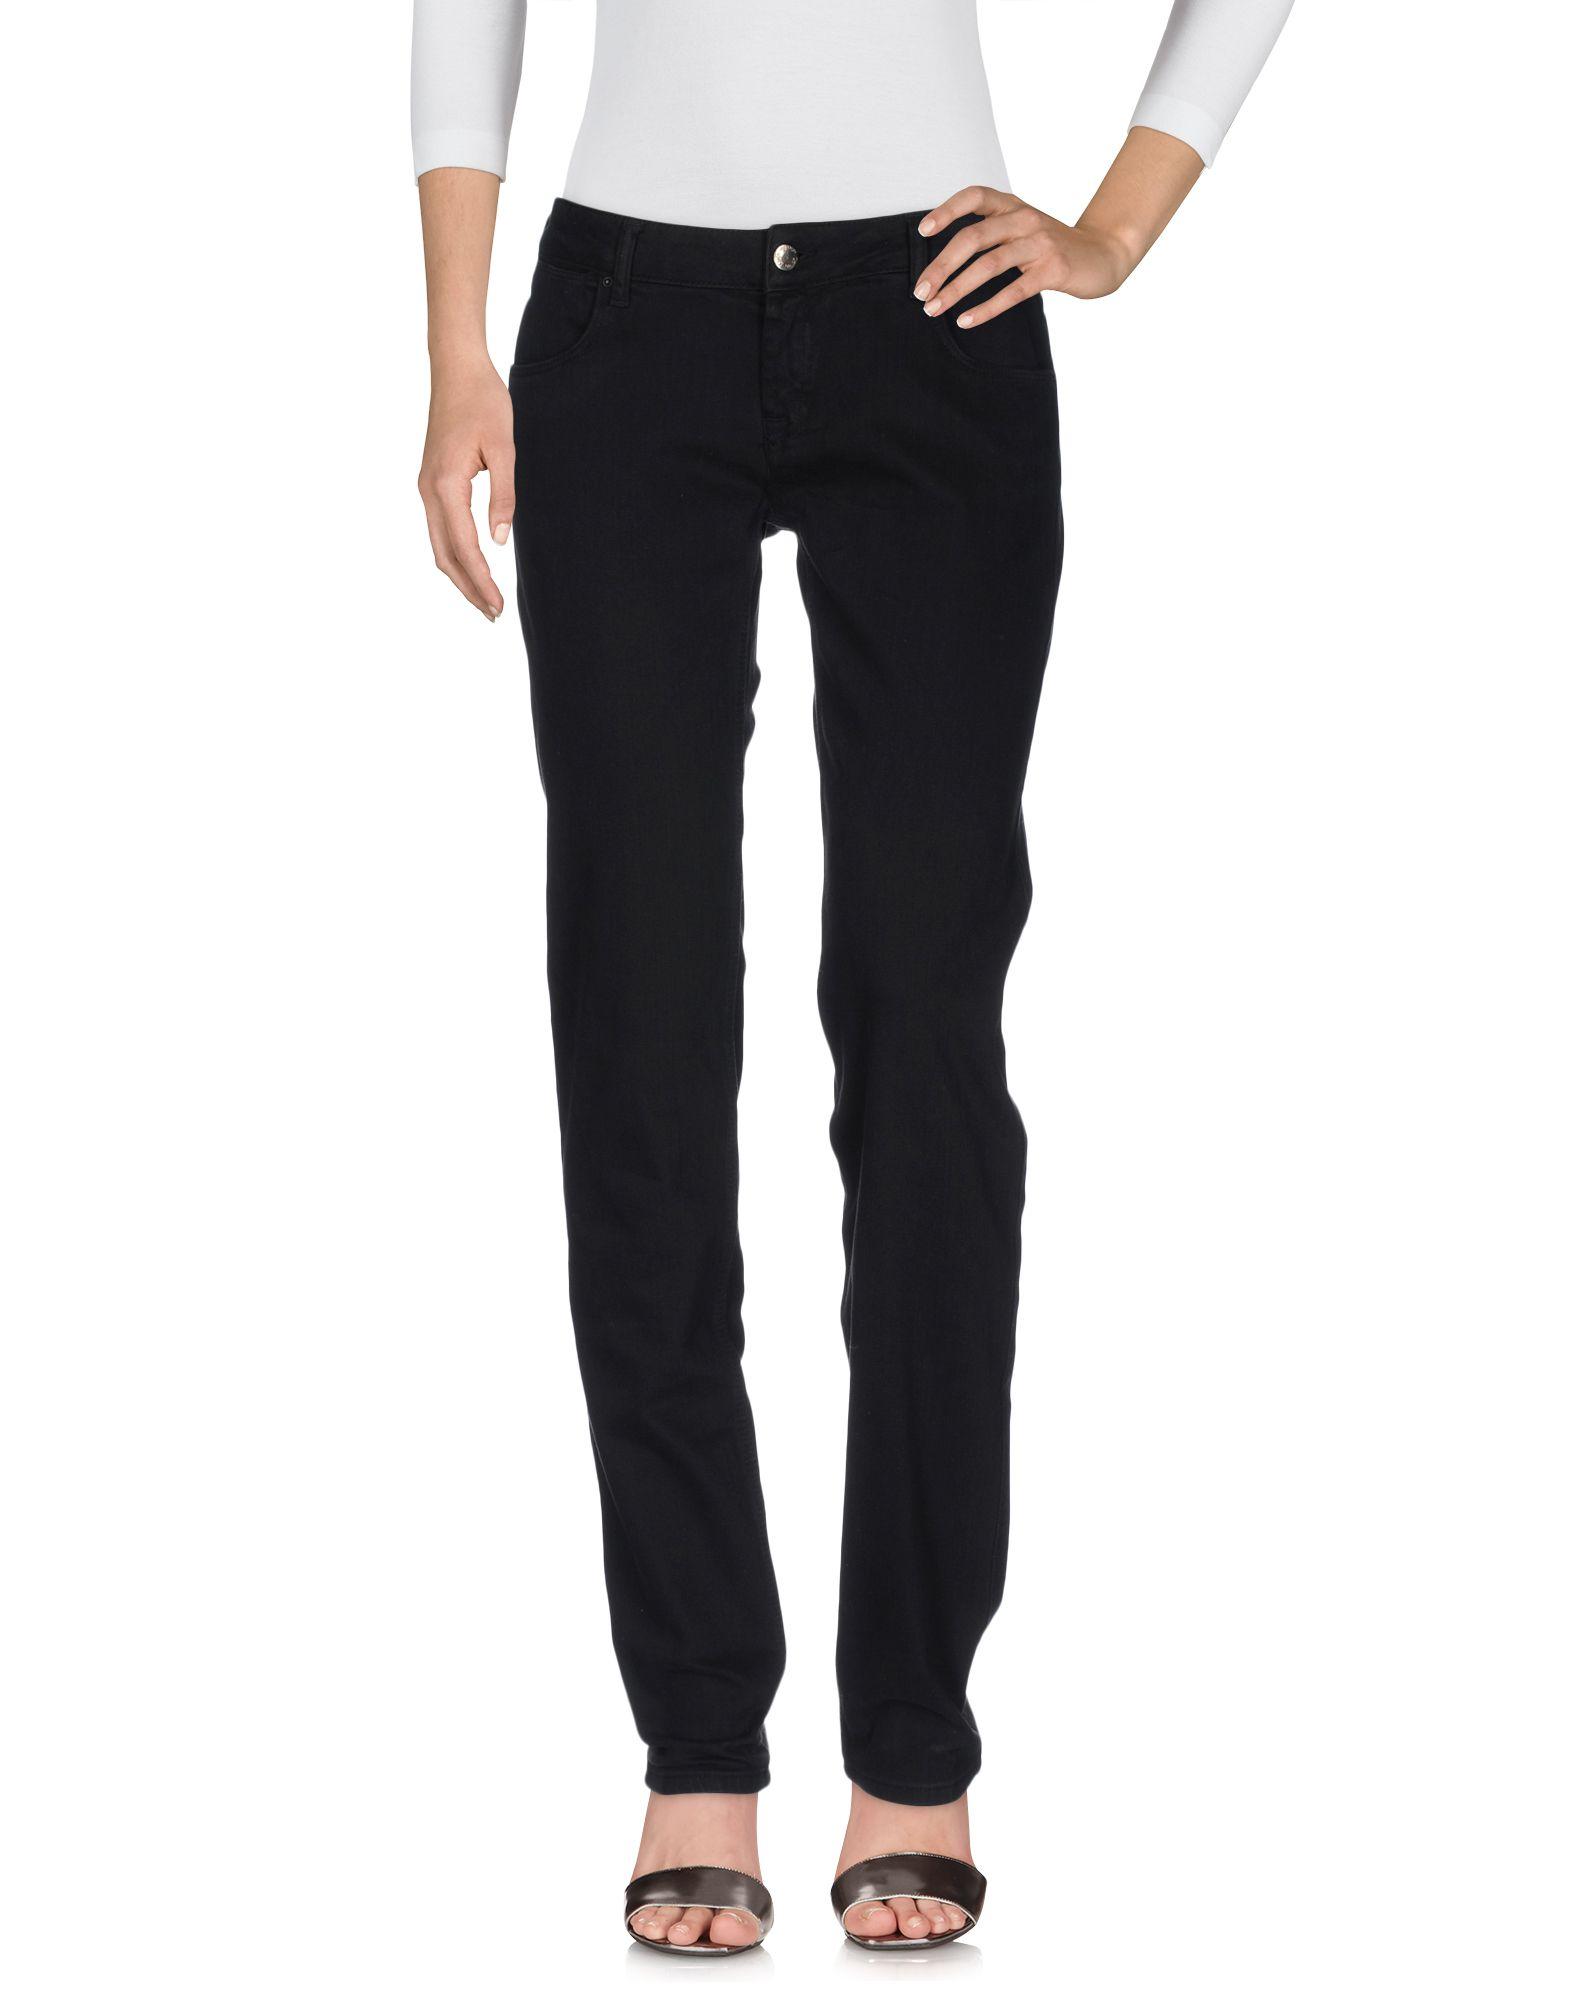 CALVIN KLEIN COLLECTION Джинсовые брюки calvin klein k1s211 20